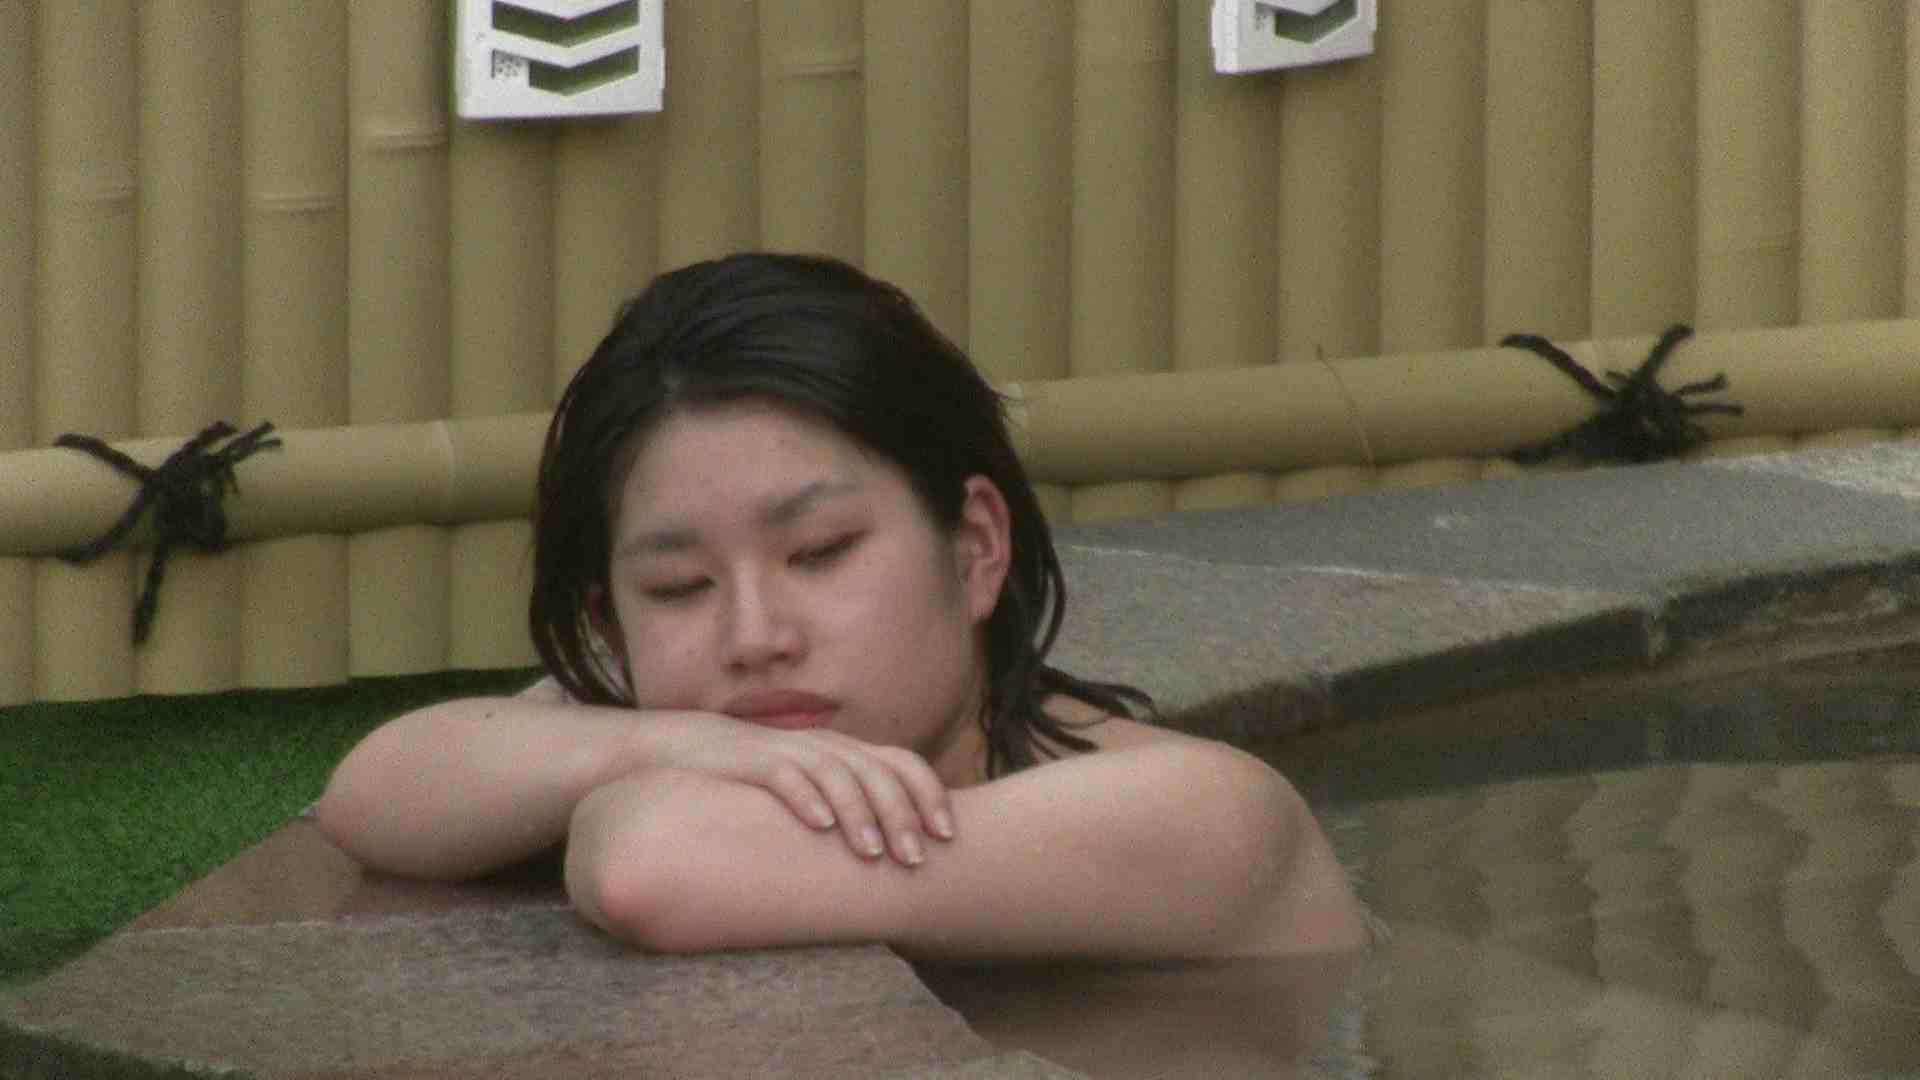 Aquaな露天風呂Vol.230 HなOL | 盗撮  83pic 29